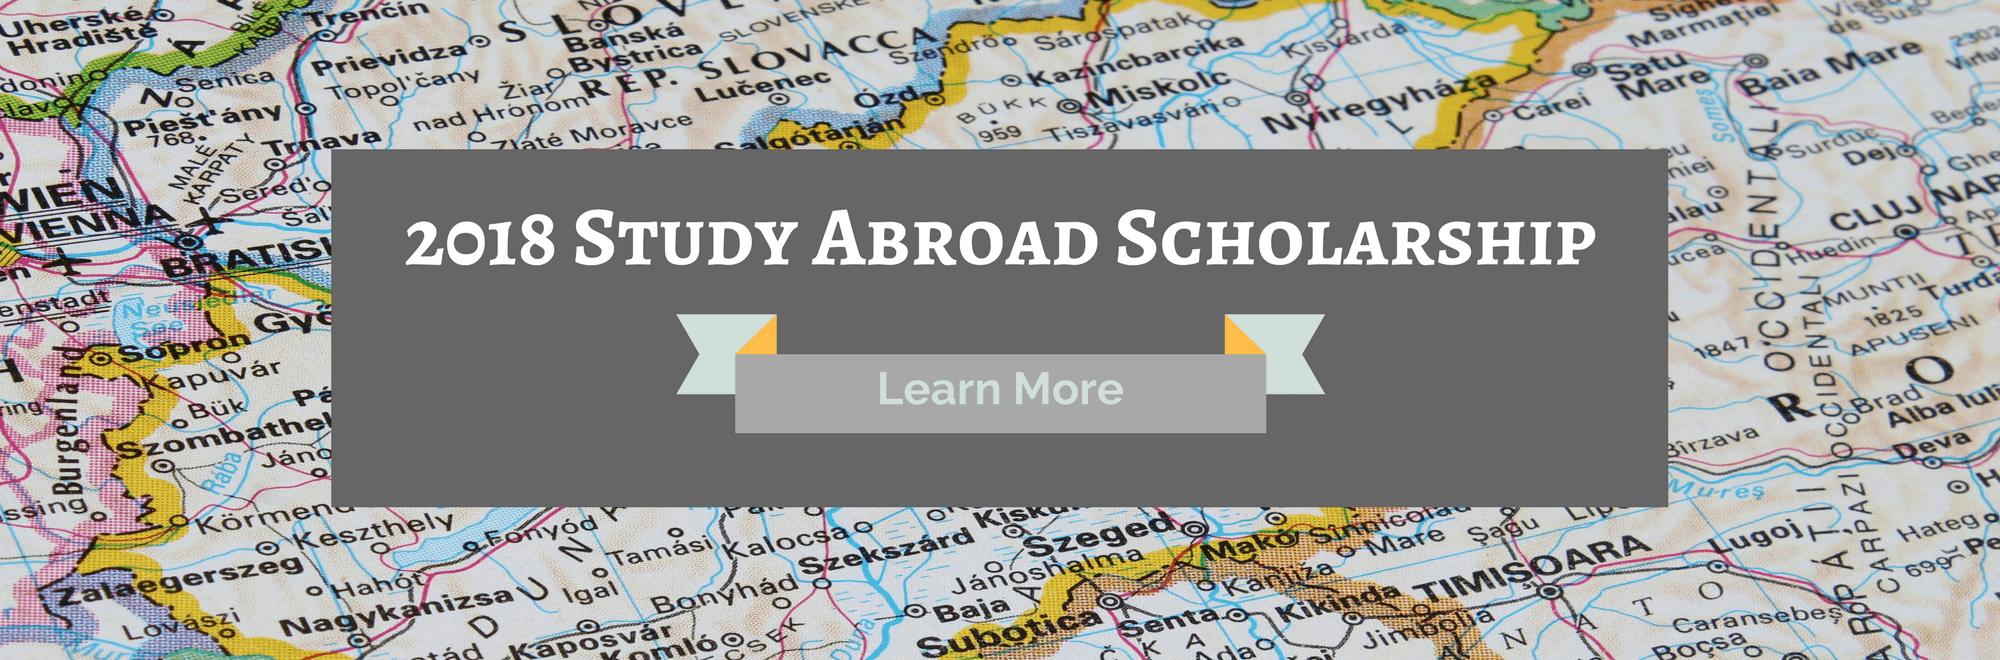 2018 Study Abroad Scholarship